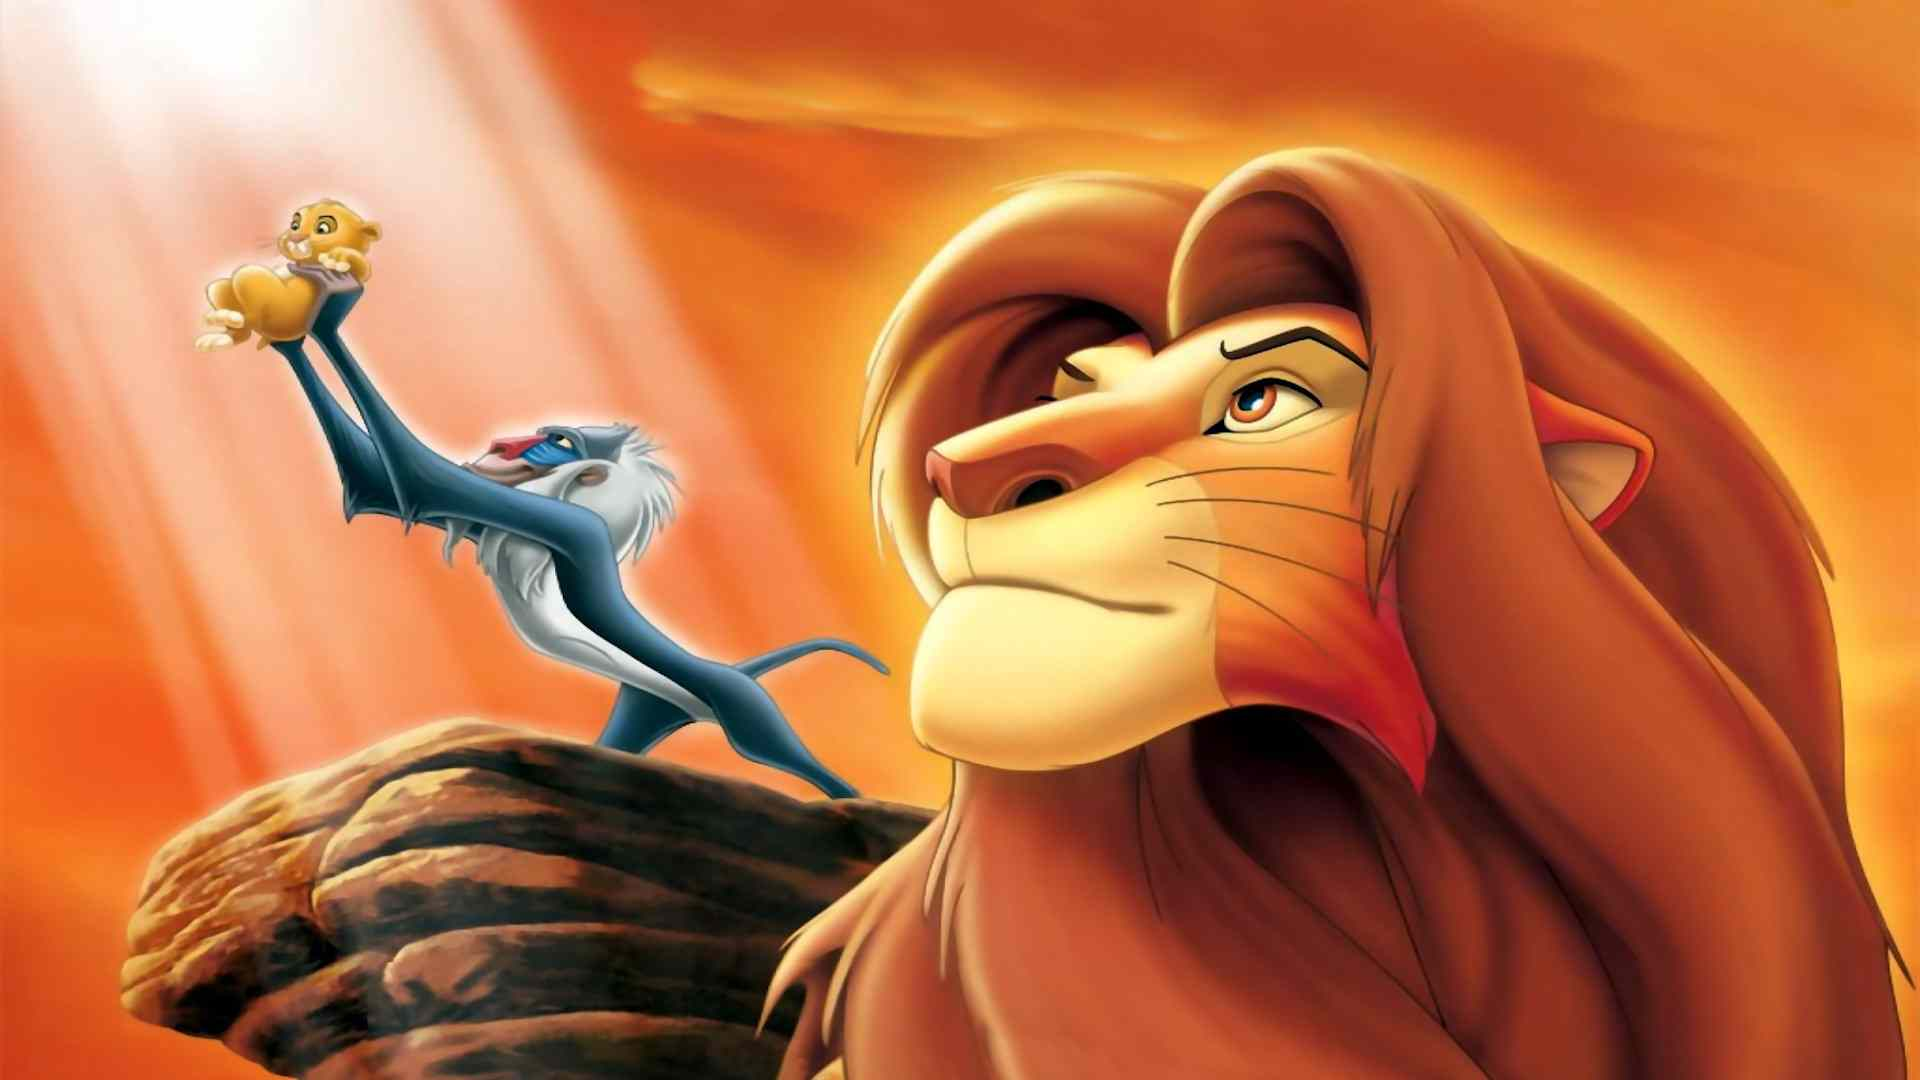 The Lion King Wallpaper Hd Wallpapermonkey The Lion King Cartoons